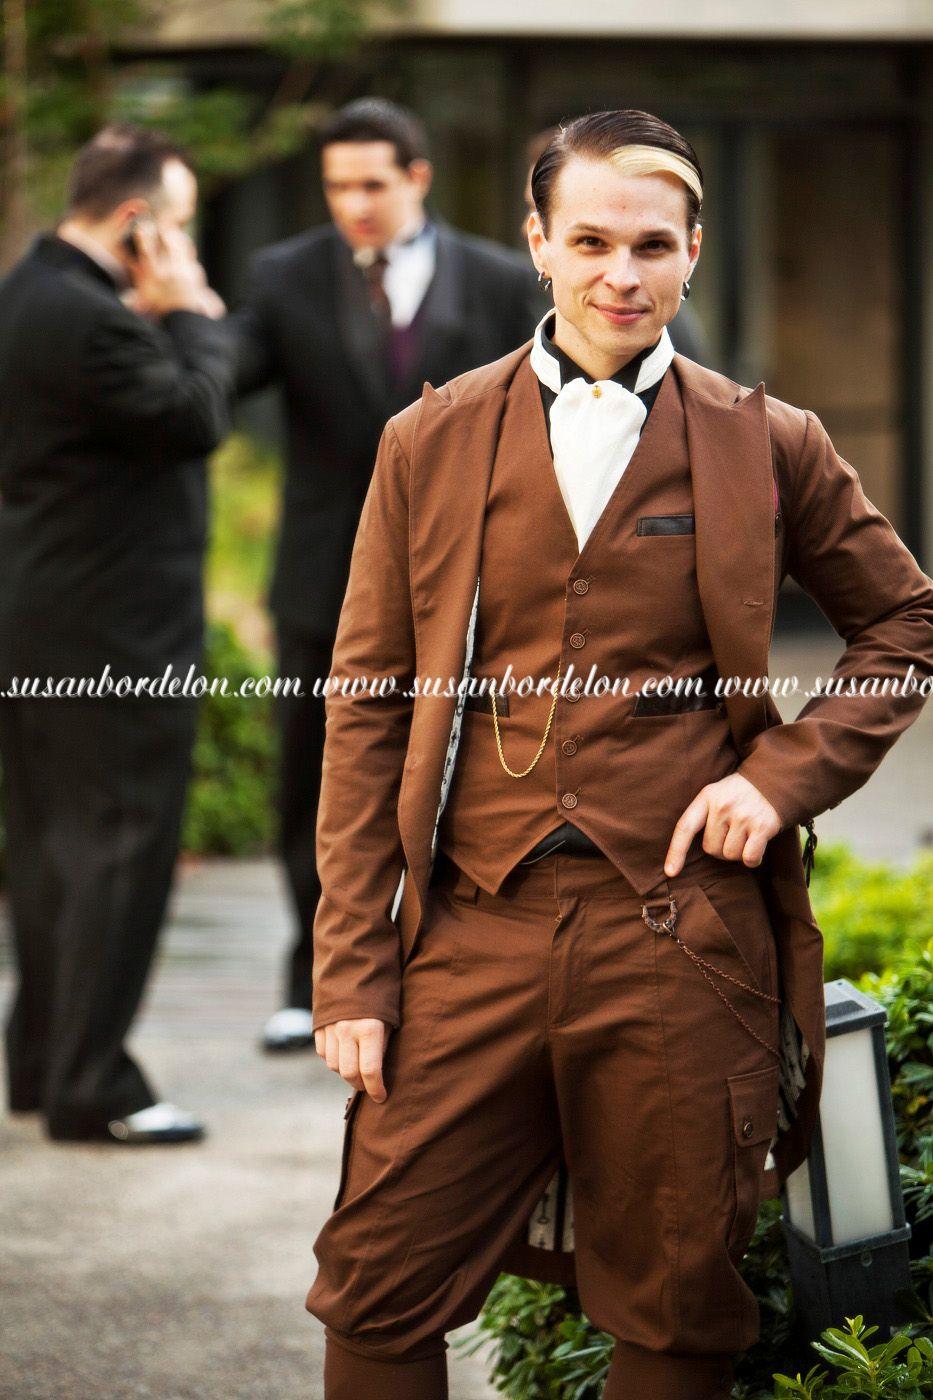 steampunk themed wedding suit | Weddings, Weddings, Weddings ...